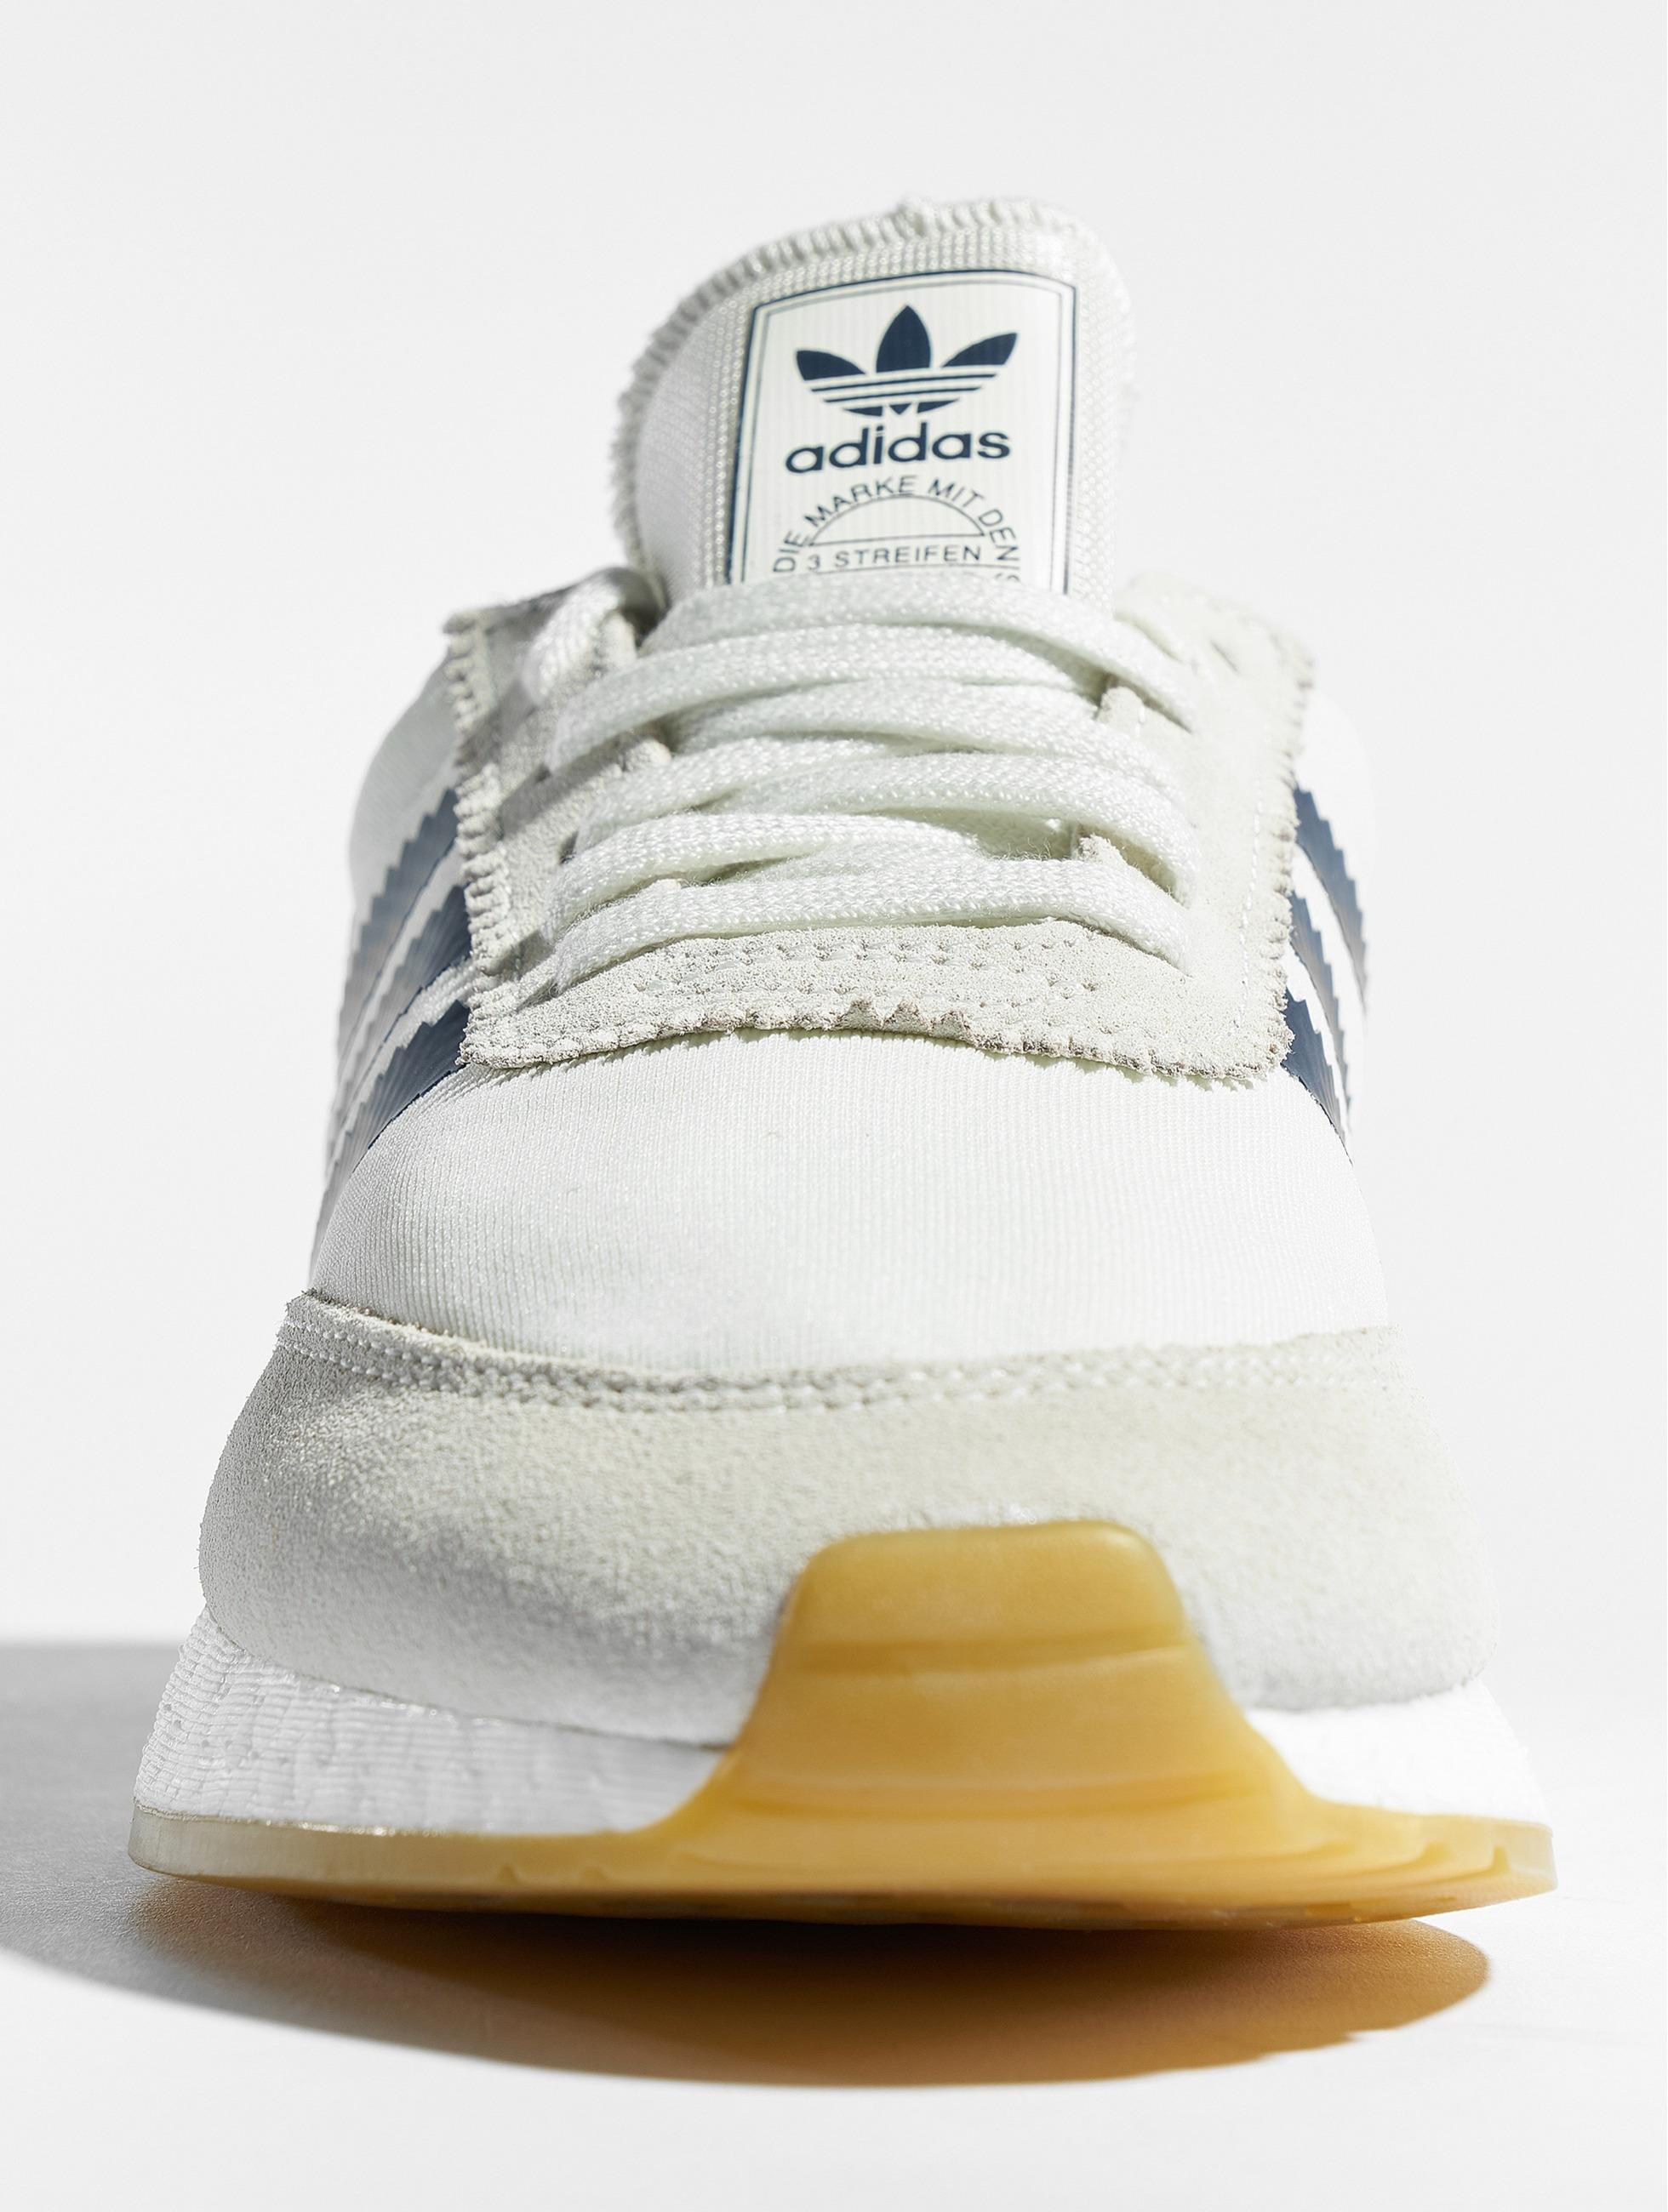 Adidas Adidas Adidas originals Herren Schuhe   Turnschuhe I-5923 081970